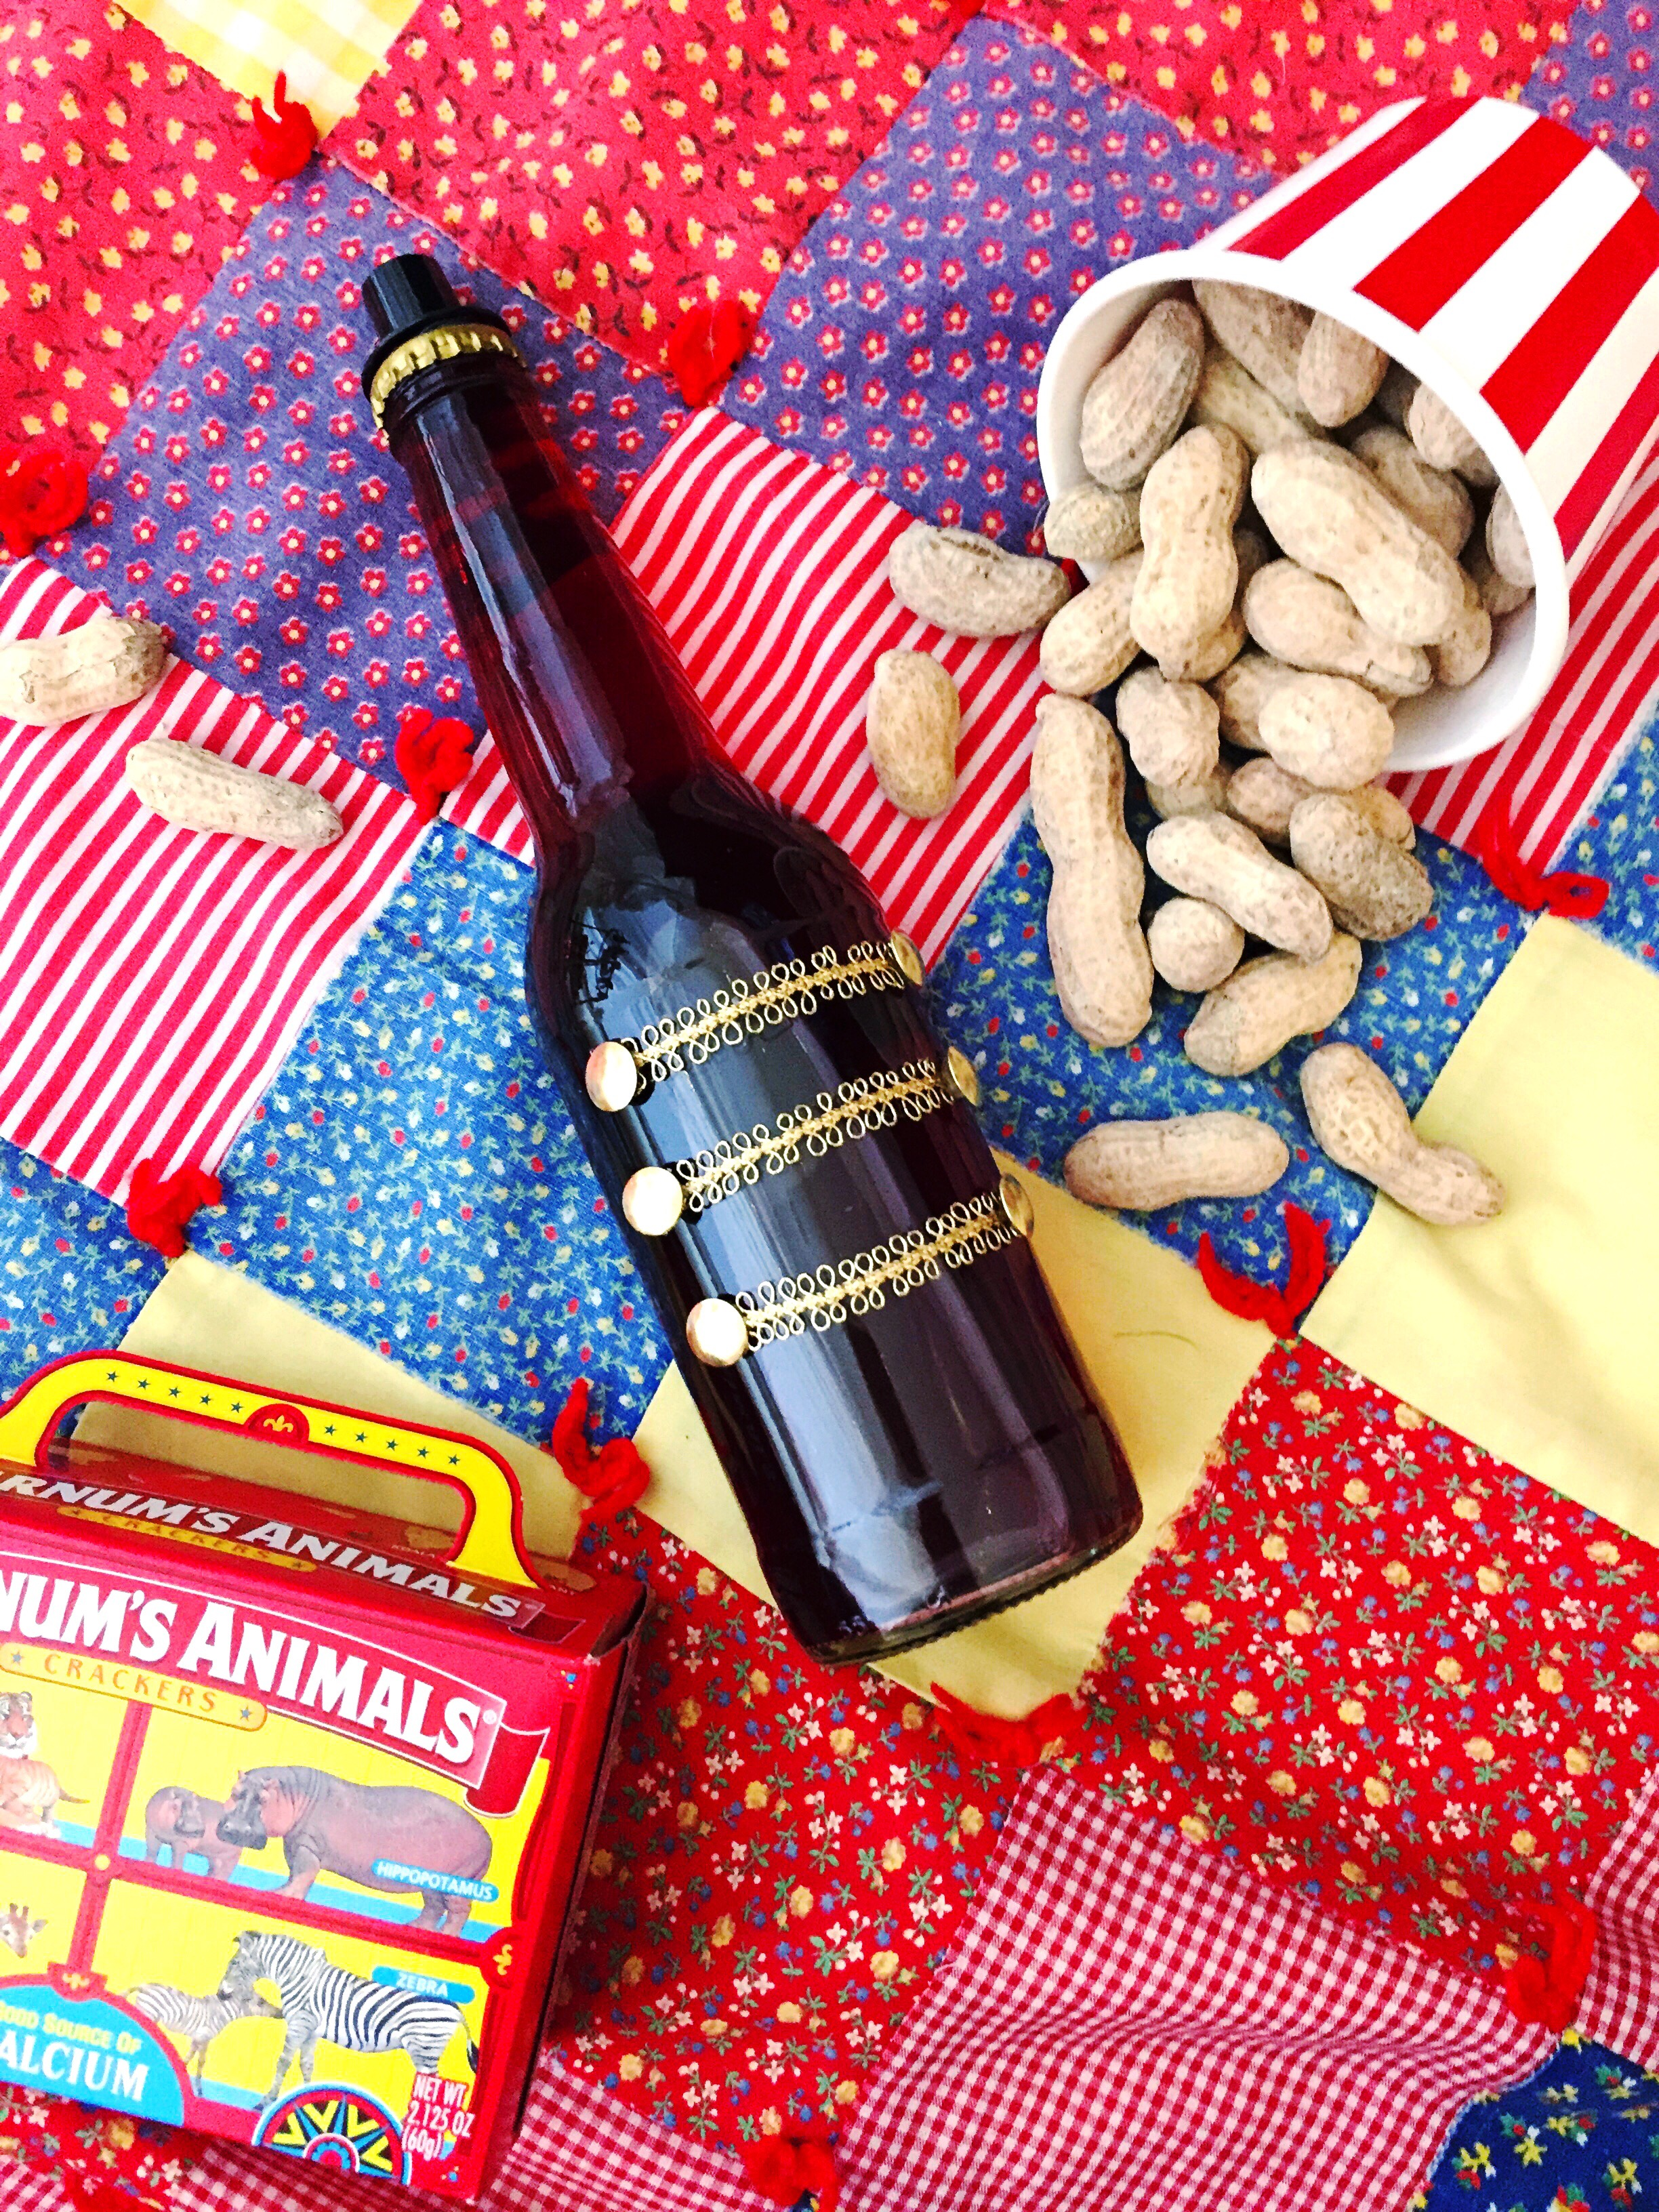 The Greatest Showman Movie Party_Crackers_Popcorn_Ringmaster Soda Bottle.JPG